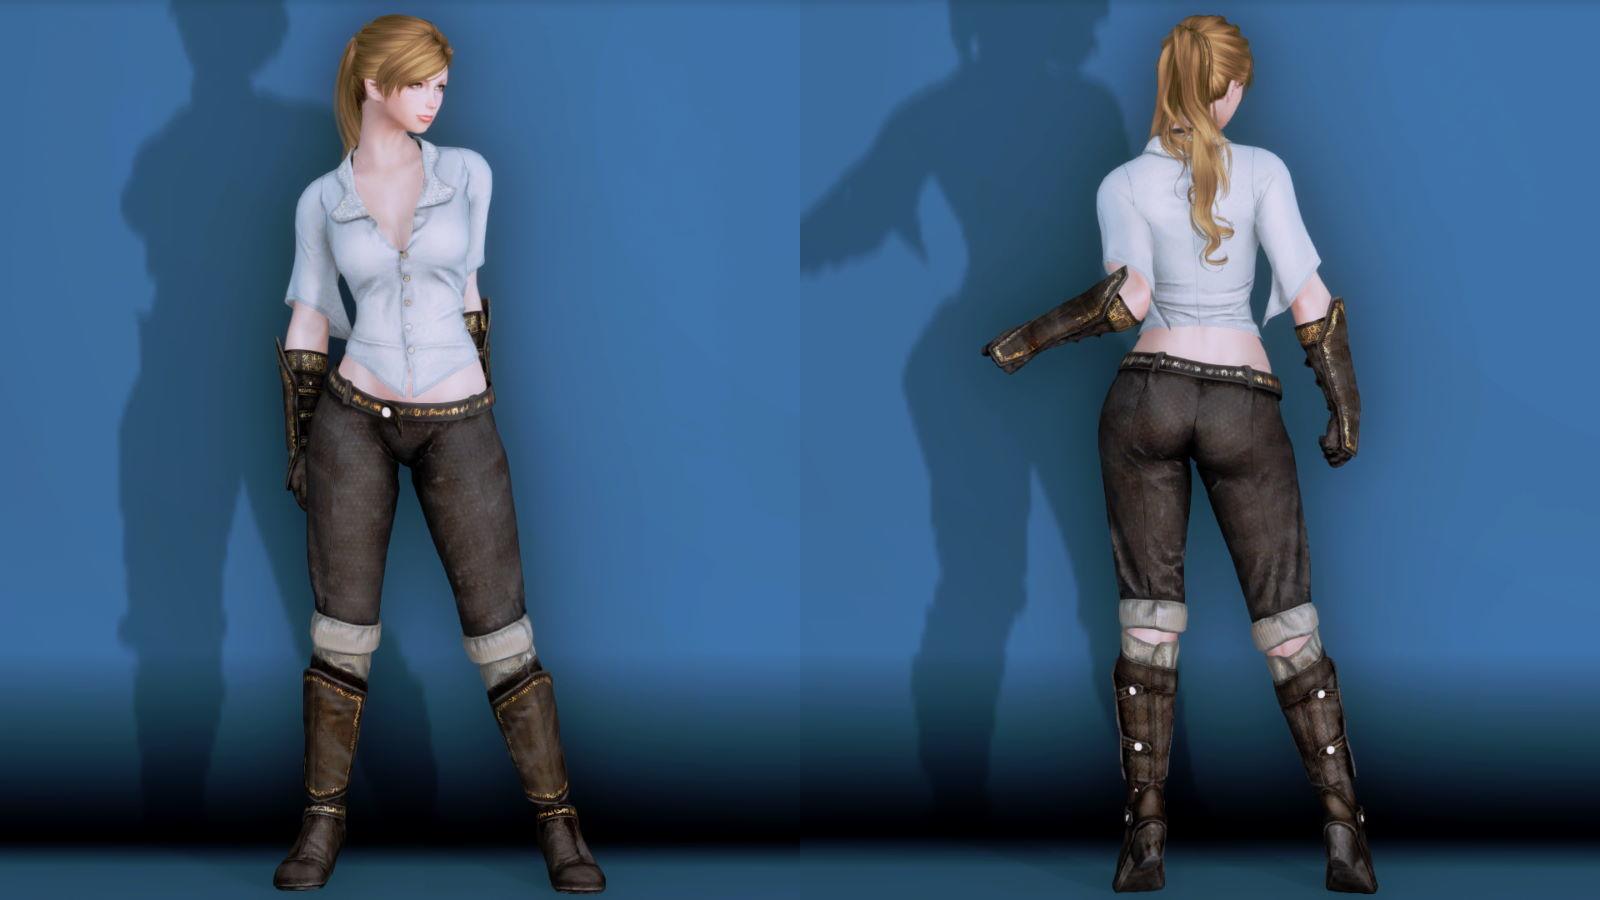 RuggedRogueSSE 131-1 Pose Fu-Ba-F Blouse Trouser 2